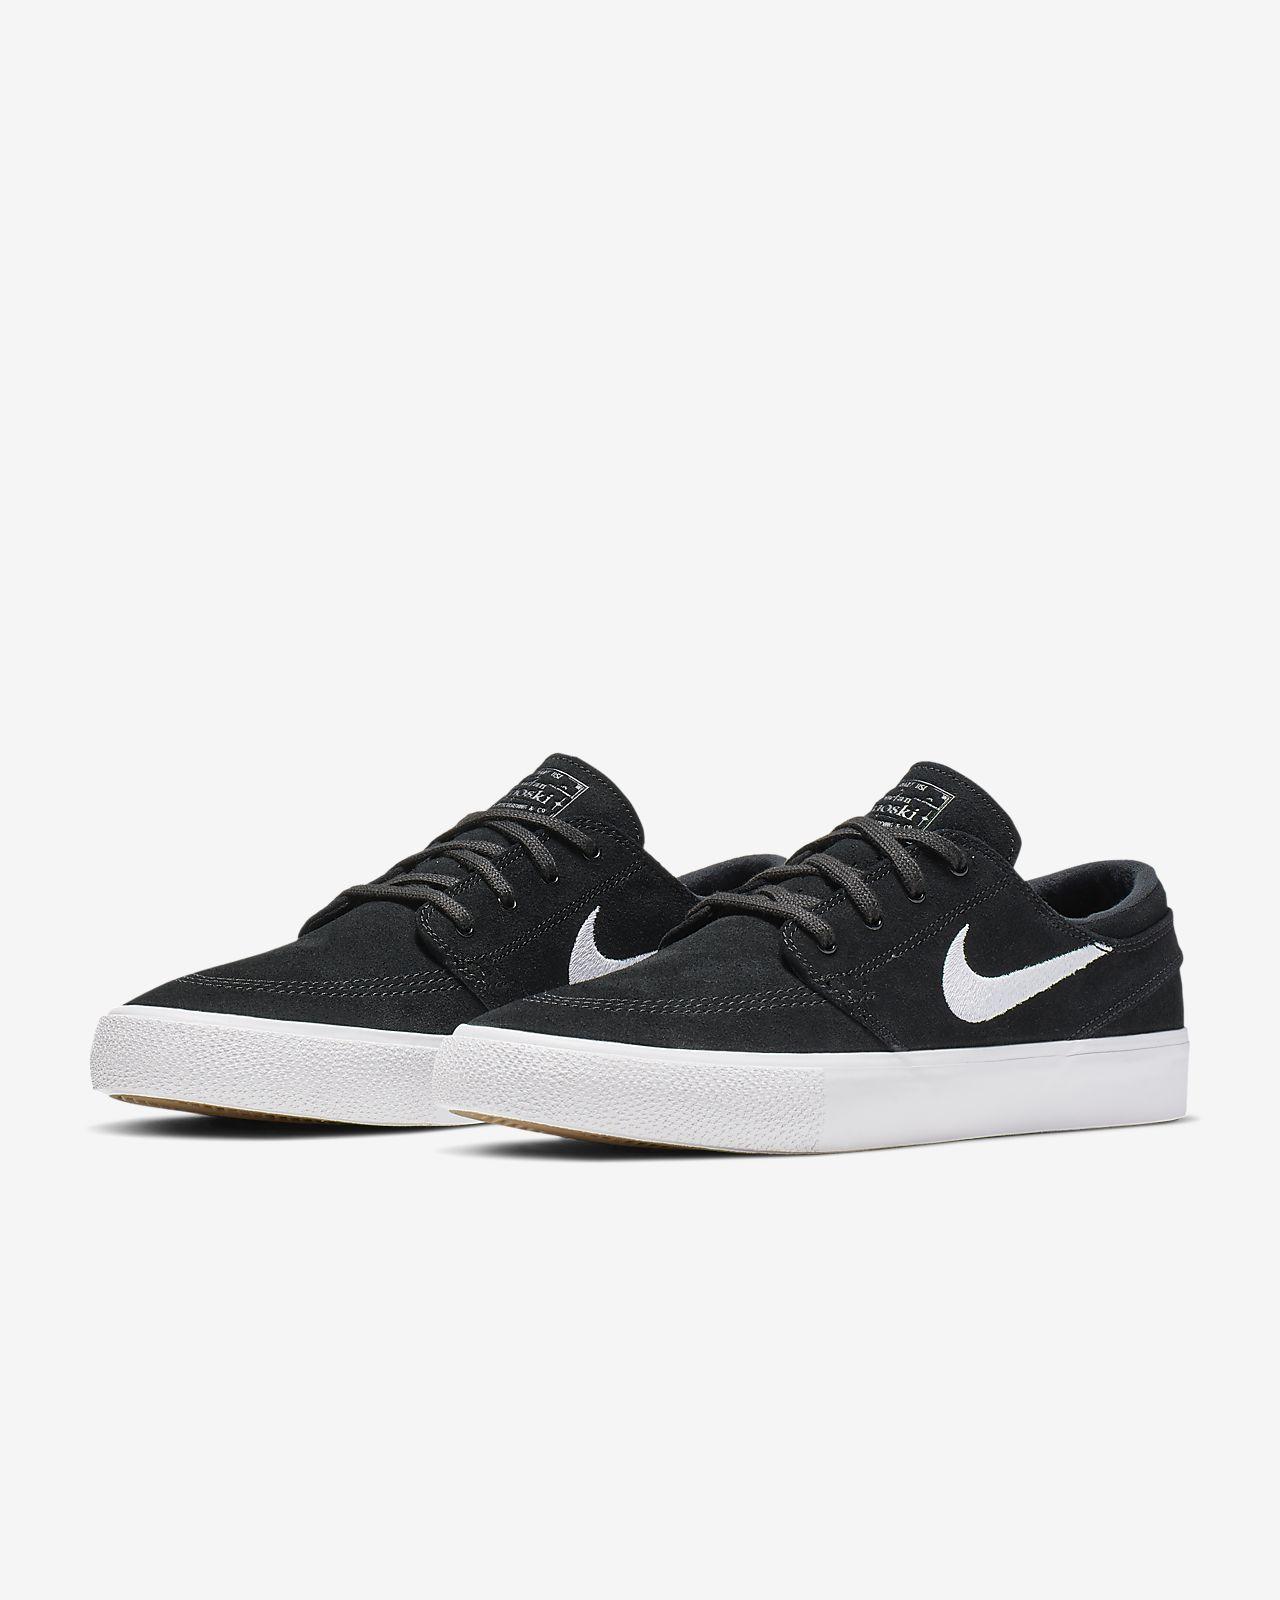 Nike SB Zoom Stefan Janoski RM M BlackThunder GreyGum